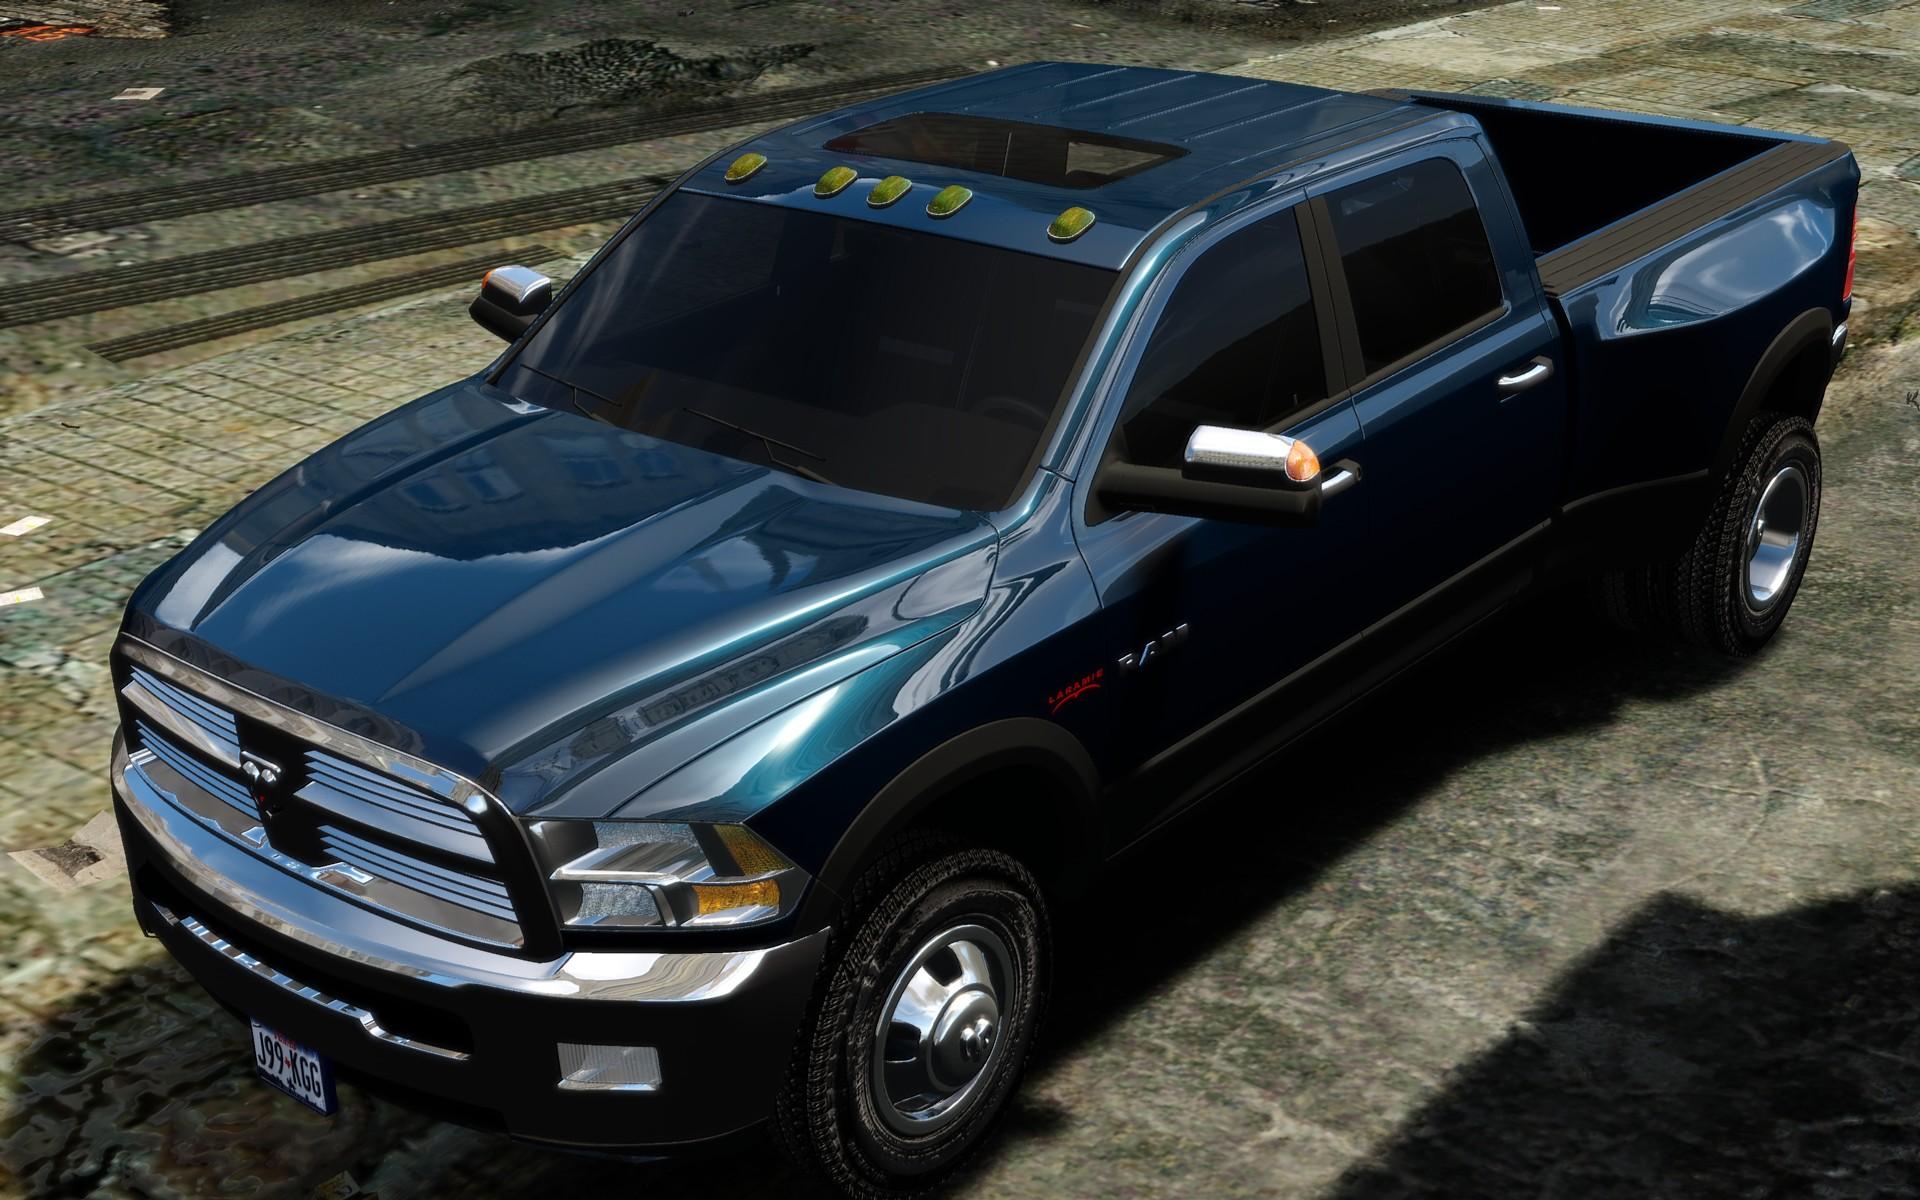 Gta Modding Com Download Area 187 Gta Iv 187 Cars 187 Dodge